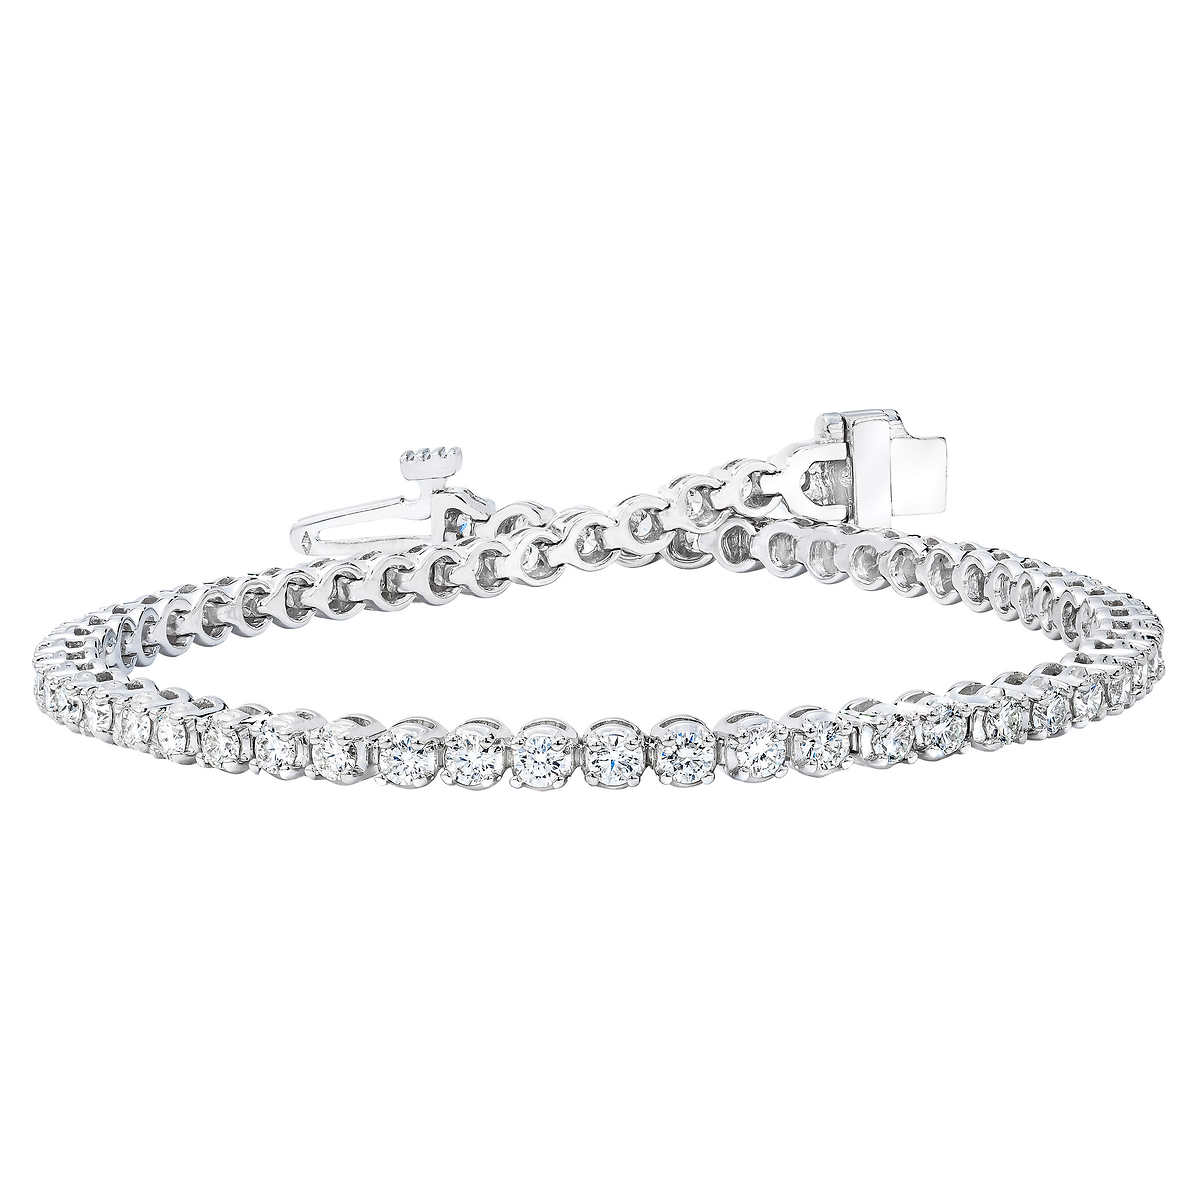 a71736966 ... Round Brilliant 2.00 ctw VS2 Clarity, I Color Diamond 14kt White Gold  Bracelet. 1 1